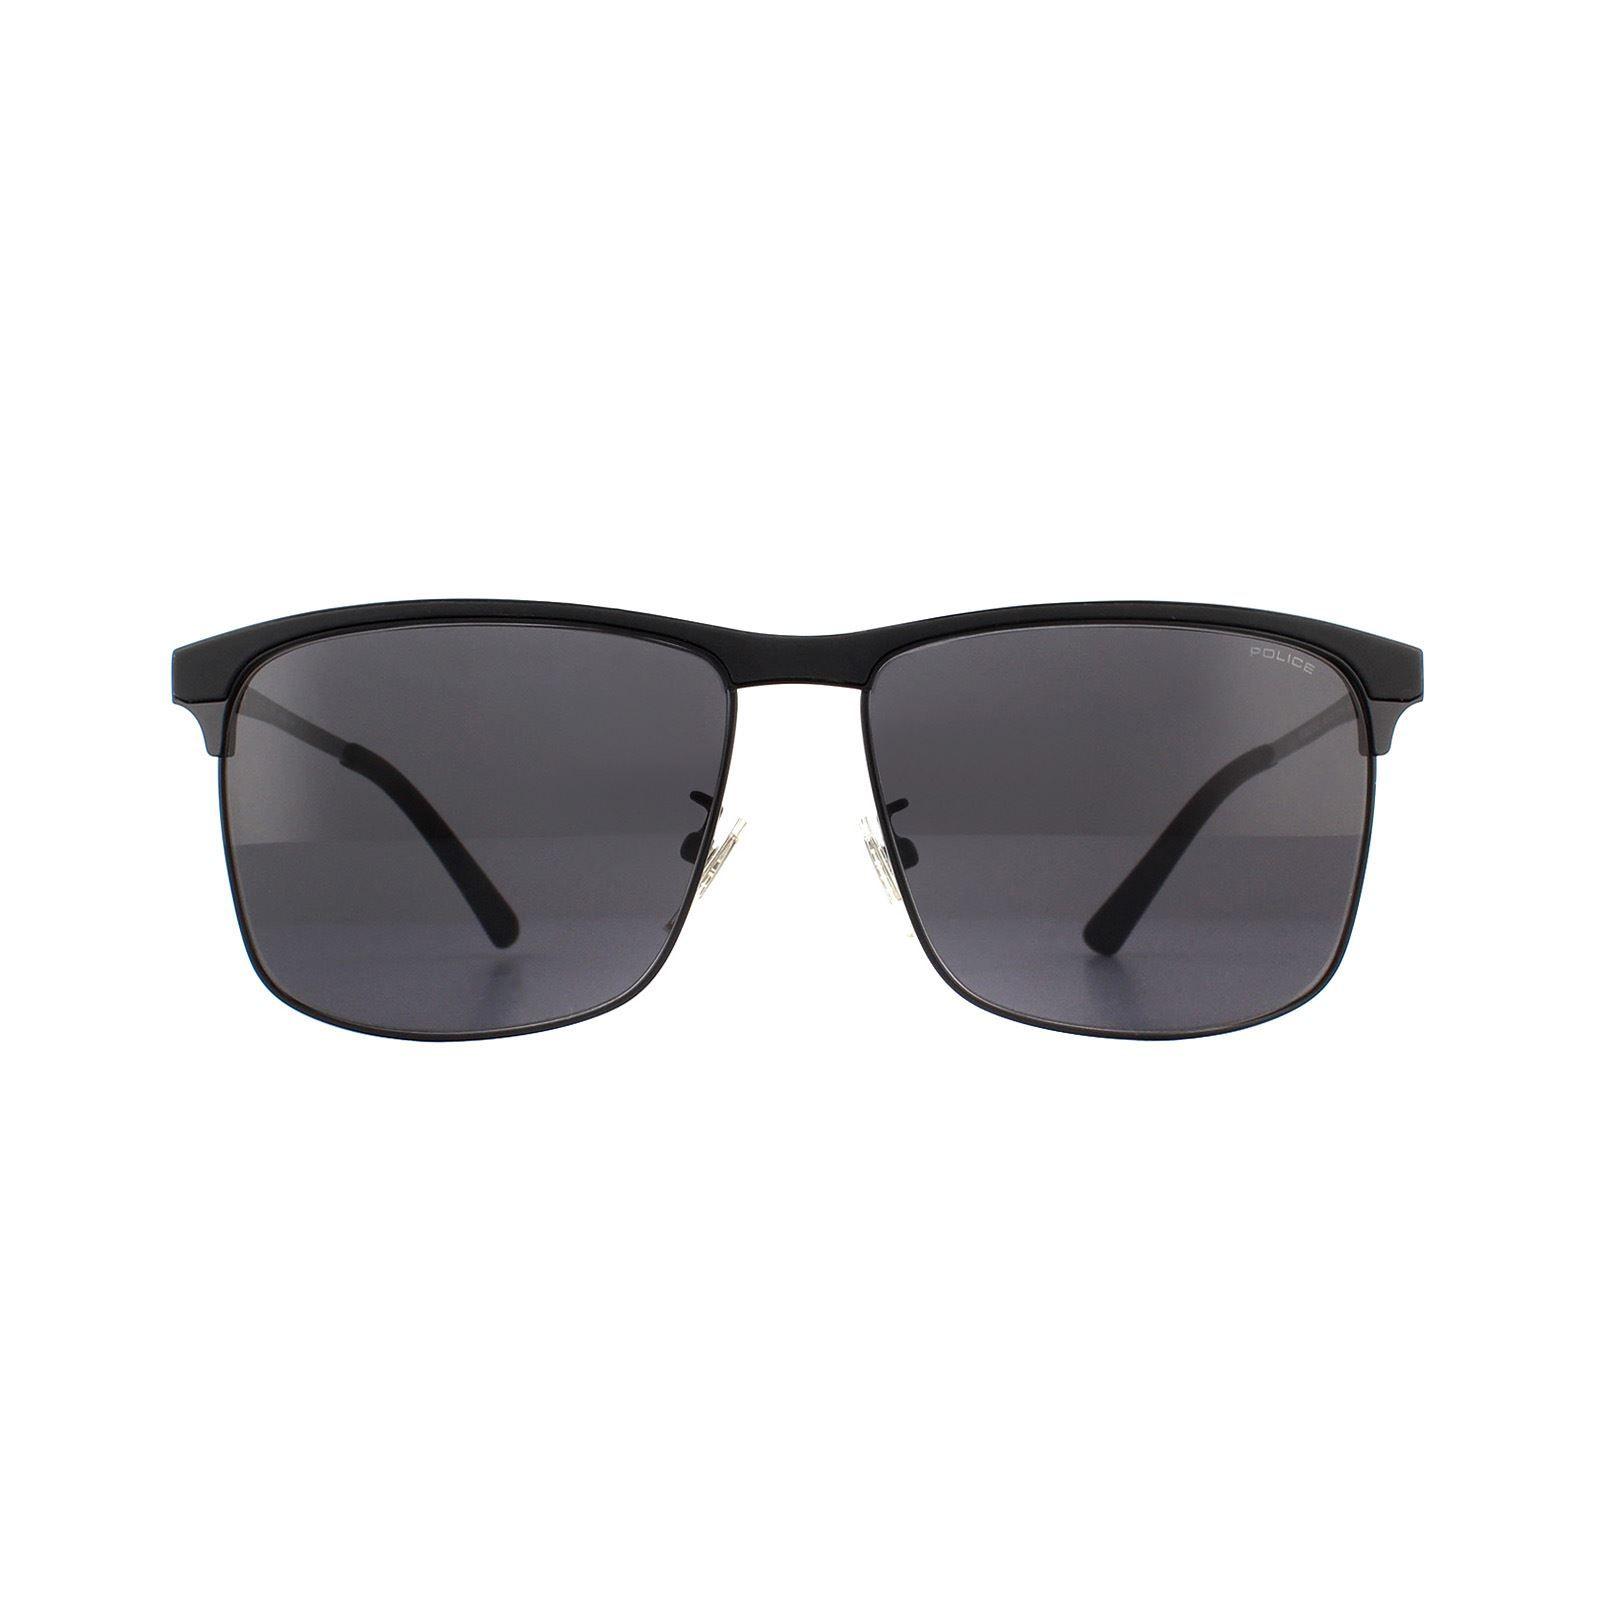 Police Sunglasses SPL570C 0530 Shiny Black Grey